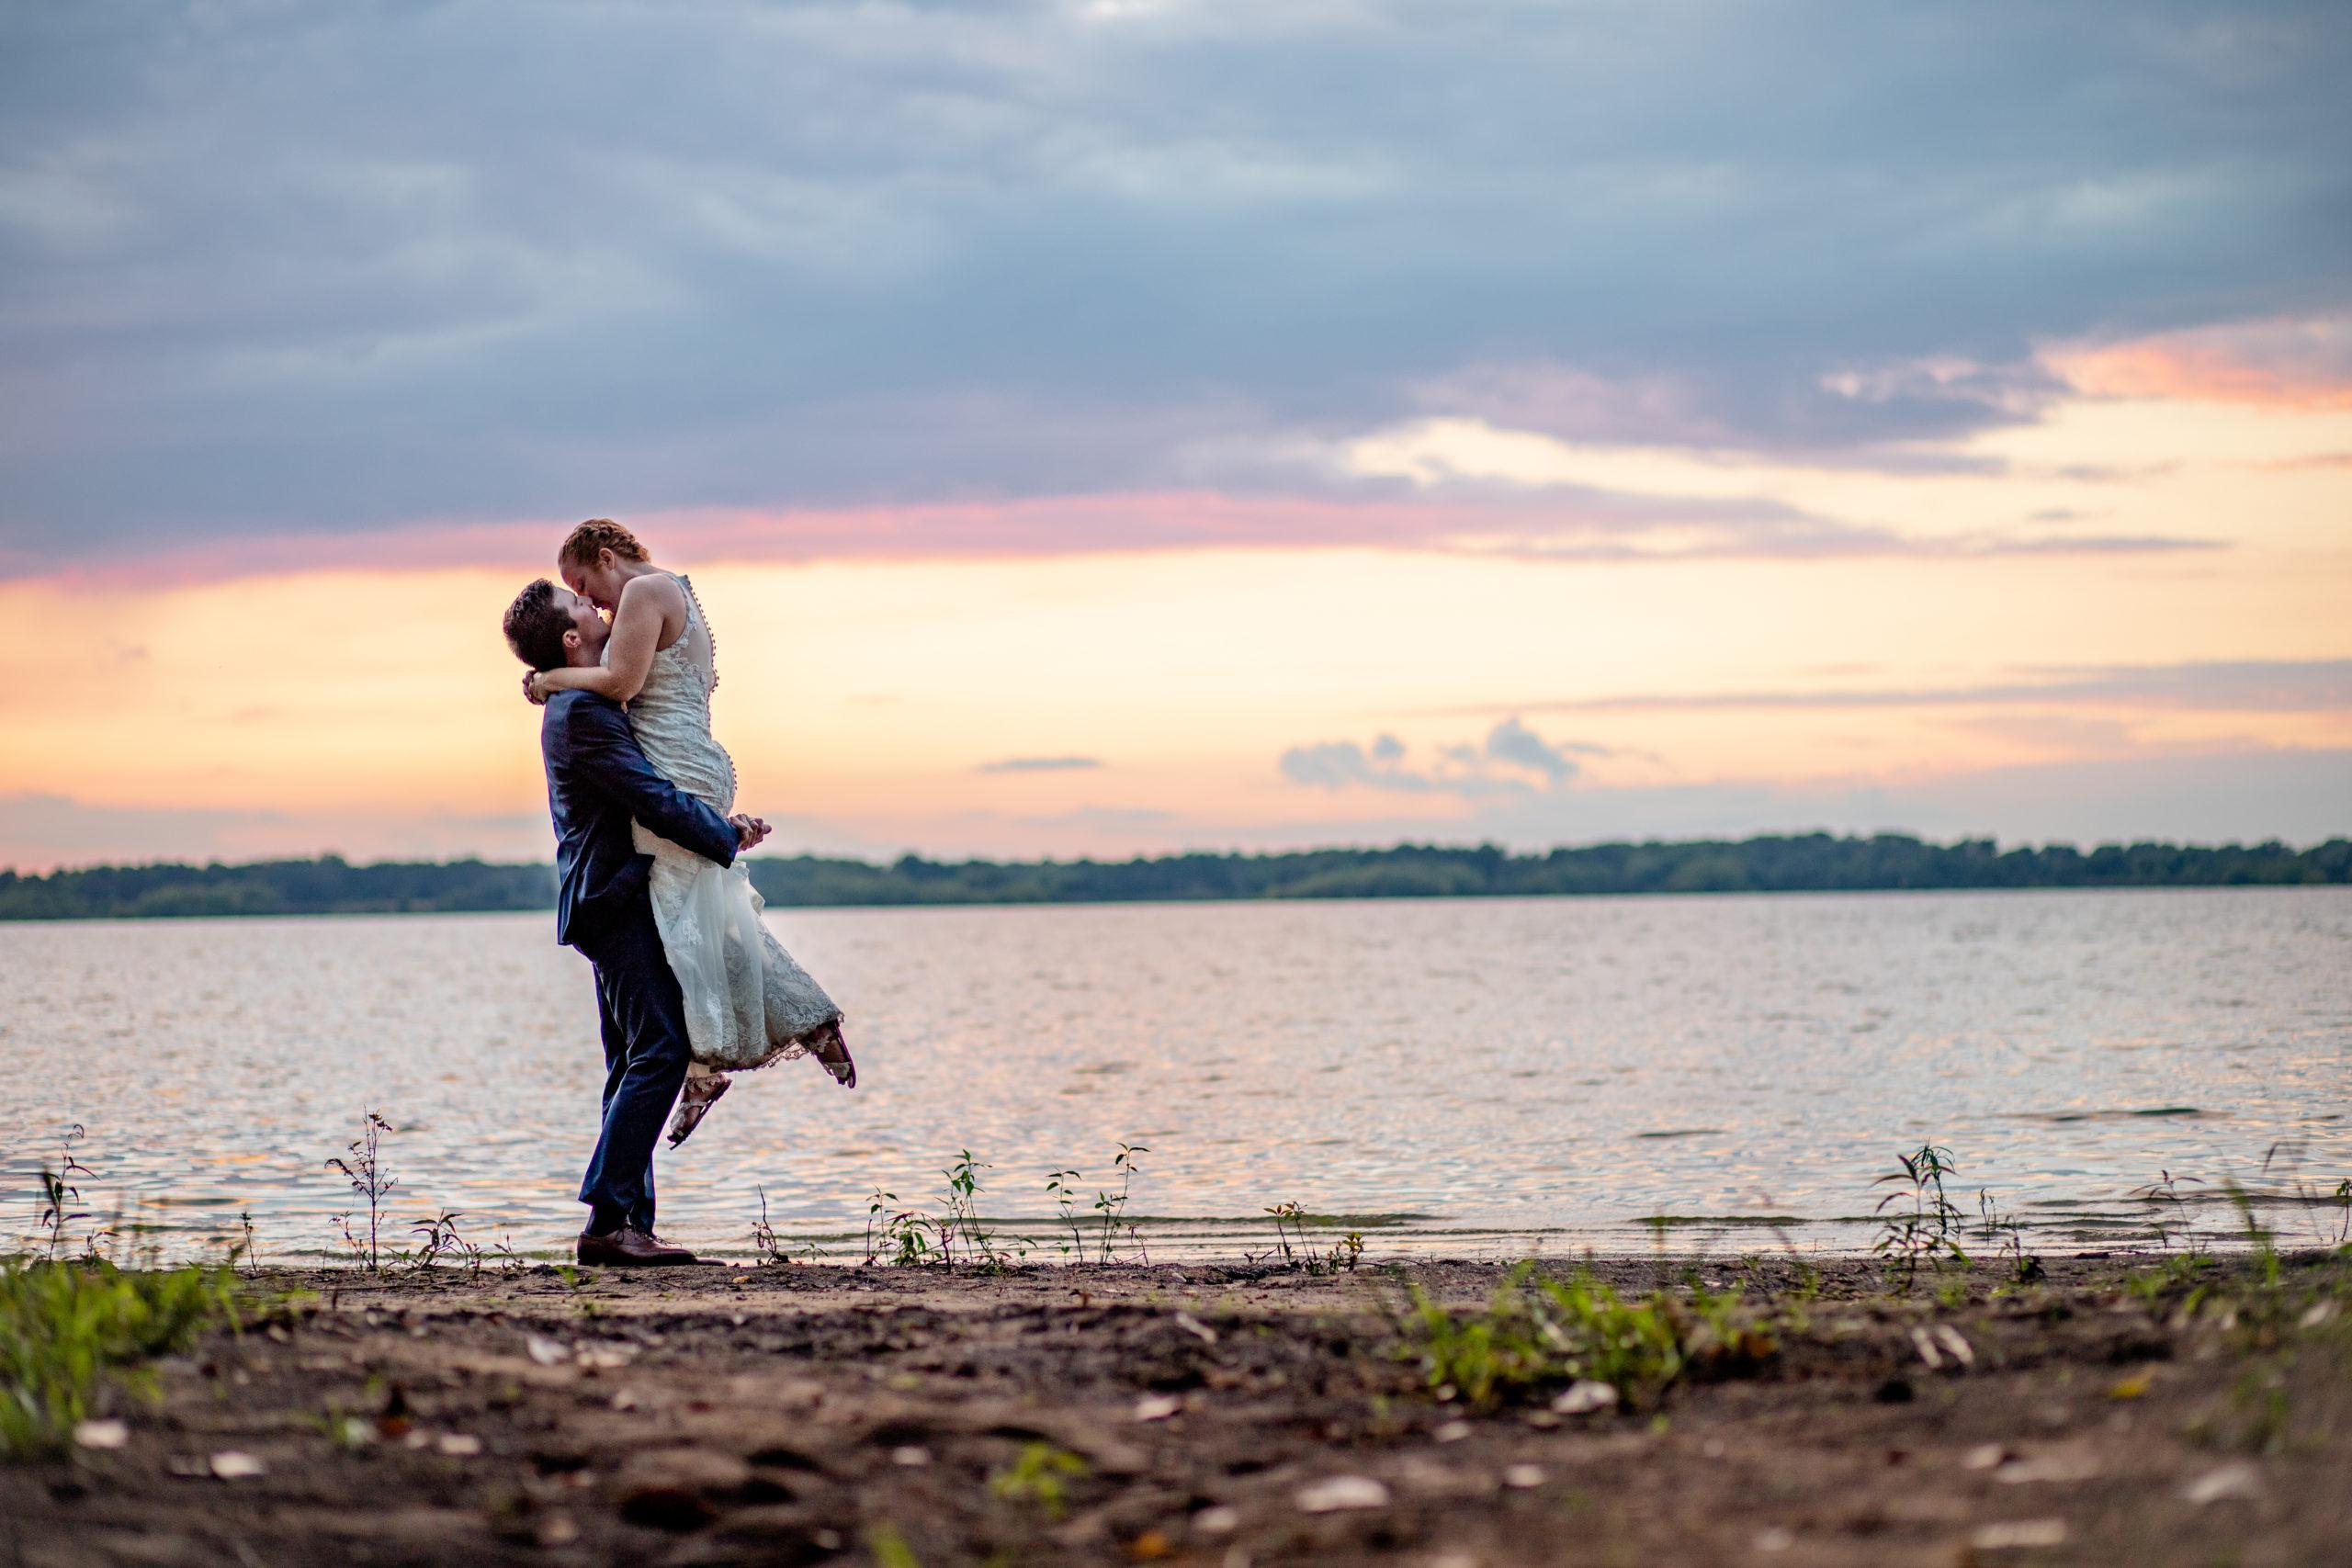 bride and groom lakeside, lakeside wedding, rend lake wedding, sunset wedding photos